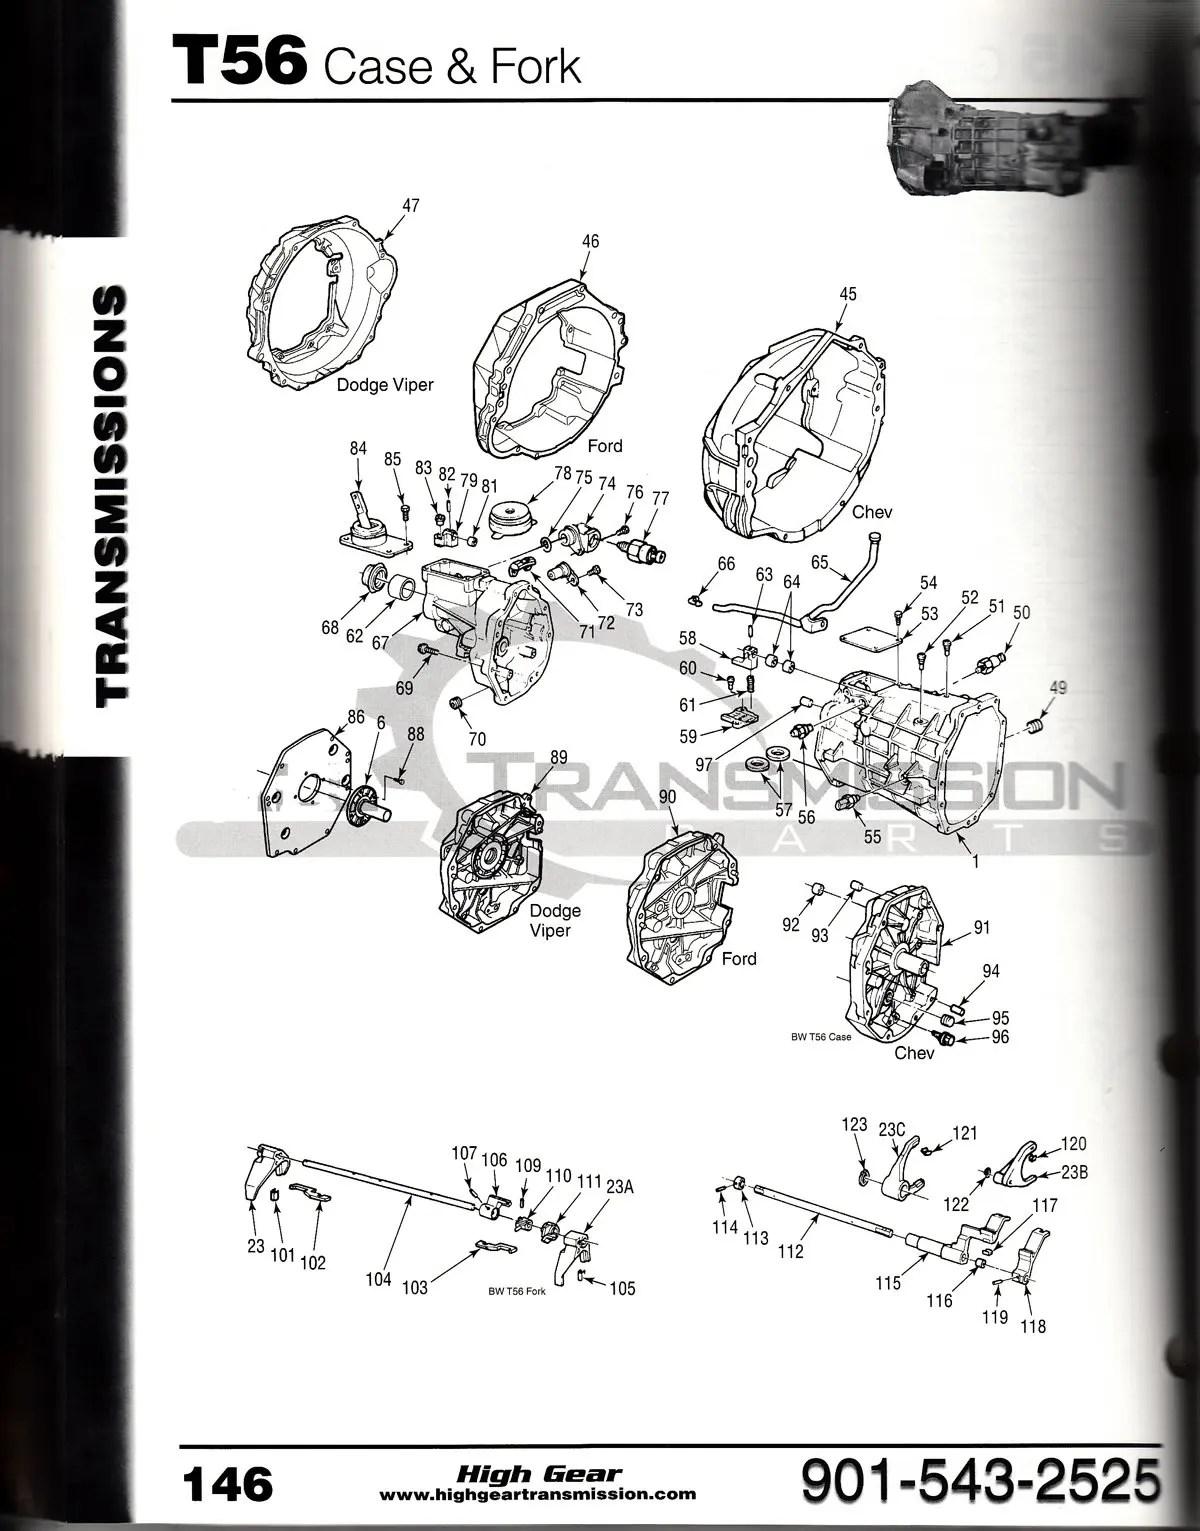 T56 Parts Diagram | Wiring Diagram